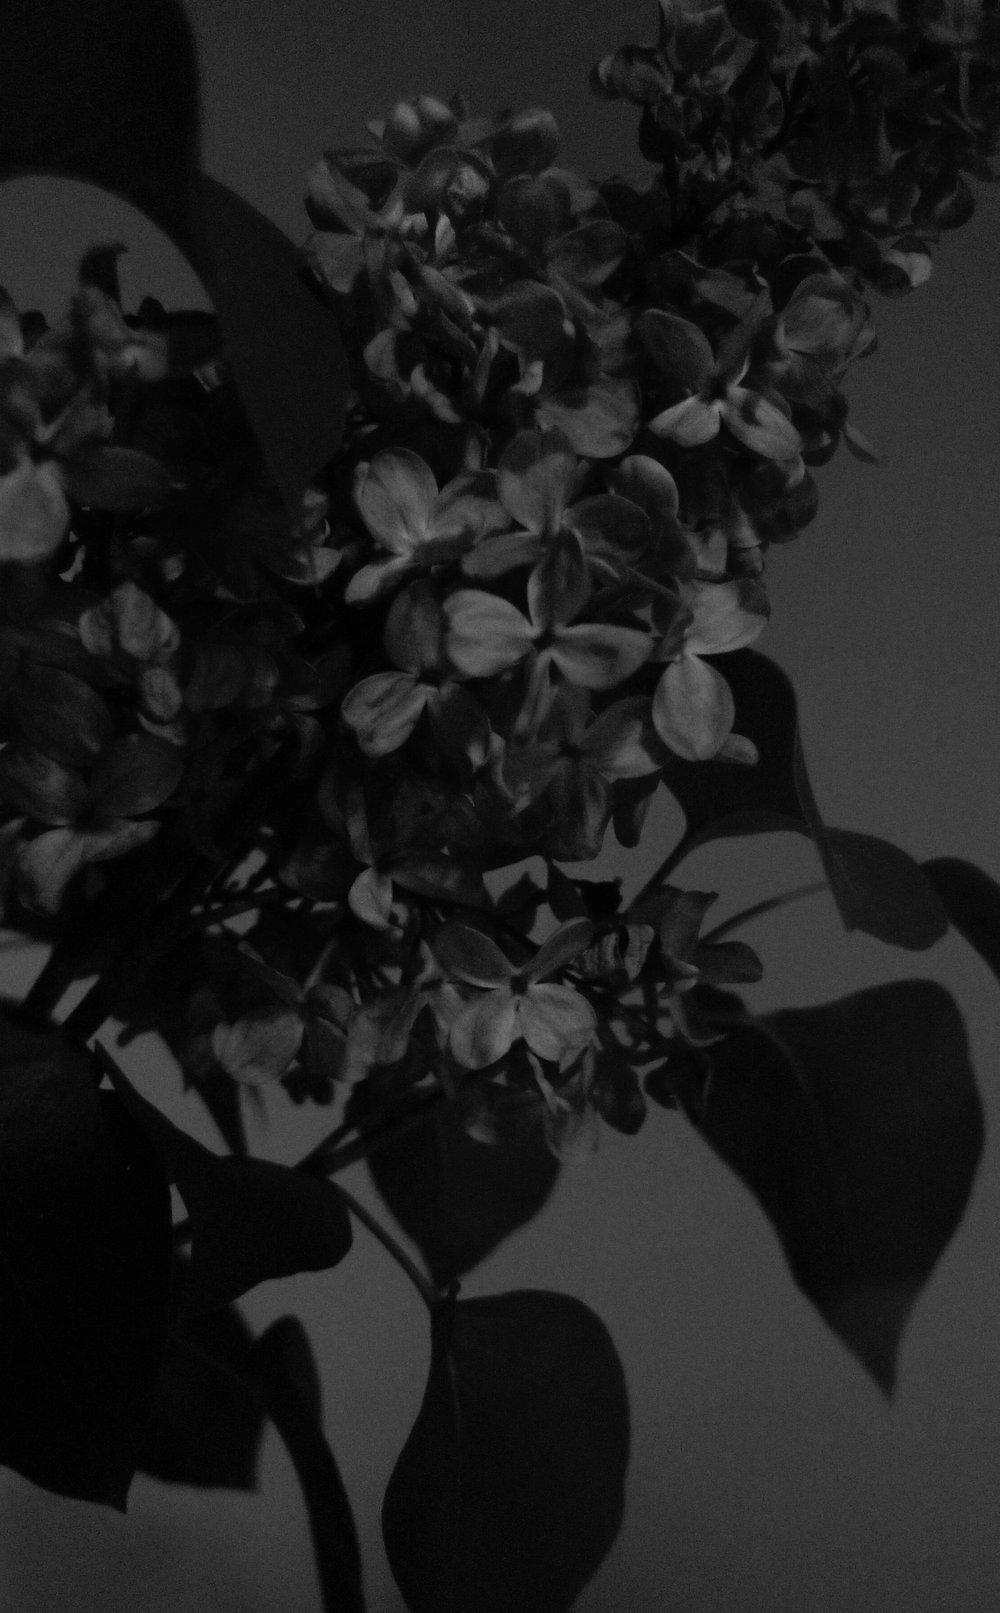 Black Lilac 1, 2017